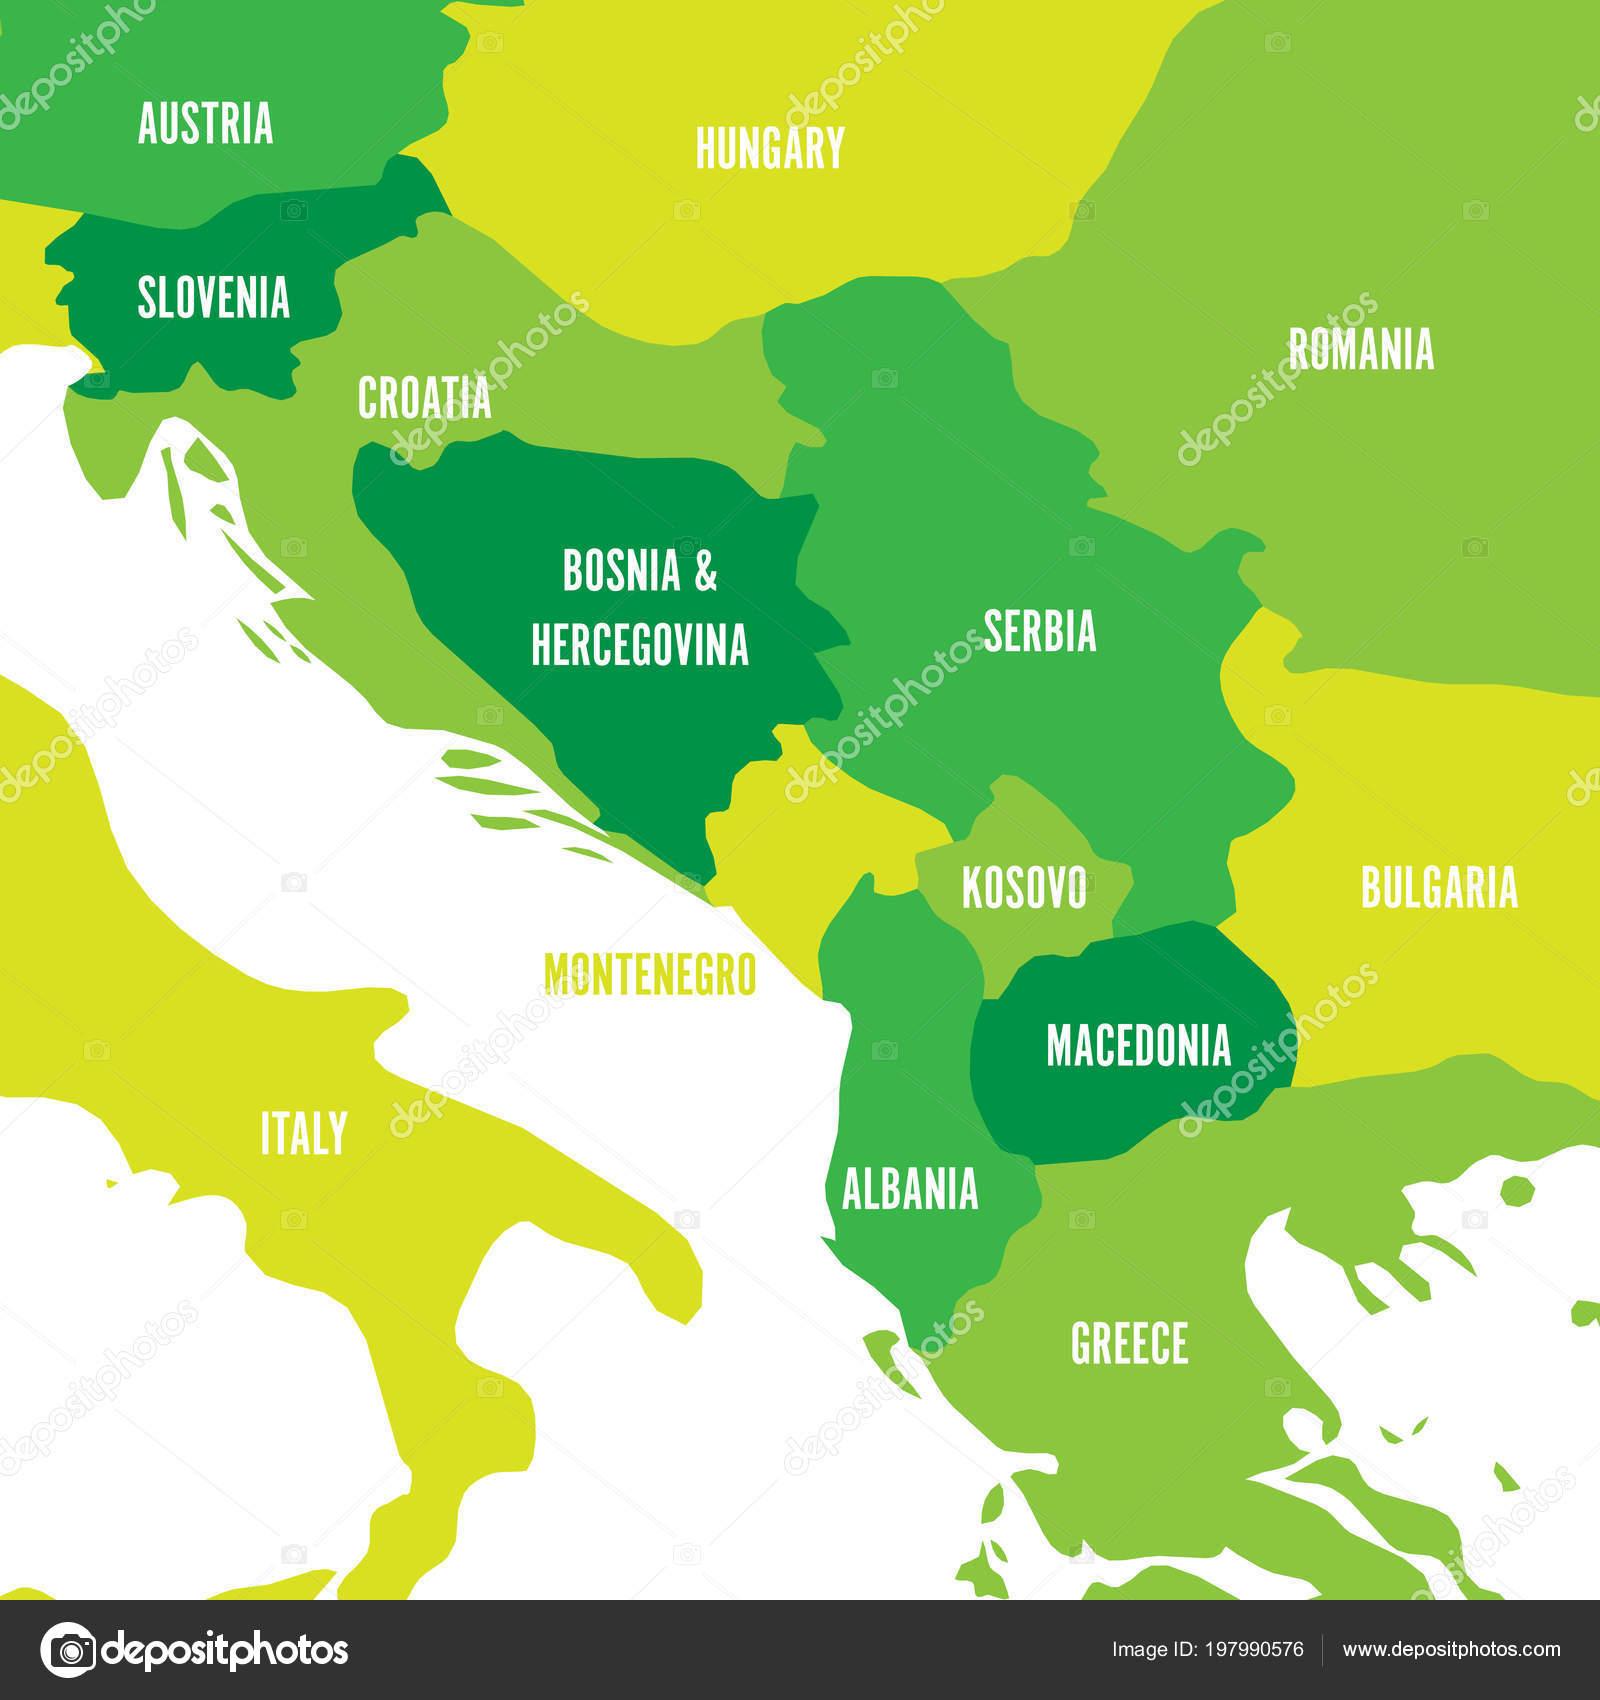 Politicka Mapa Balkanu Staty Balkanskeho Poloostrova Ctyri